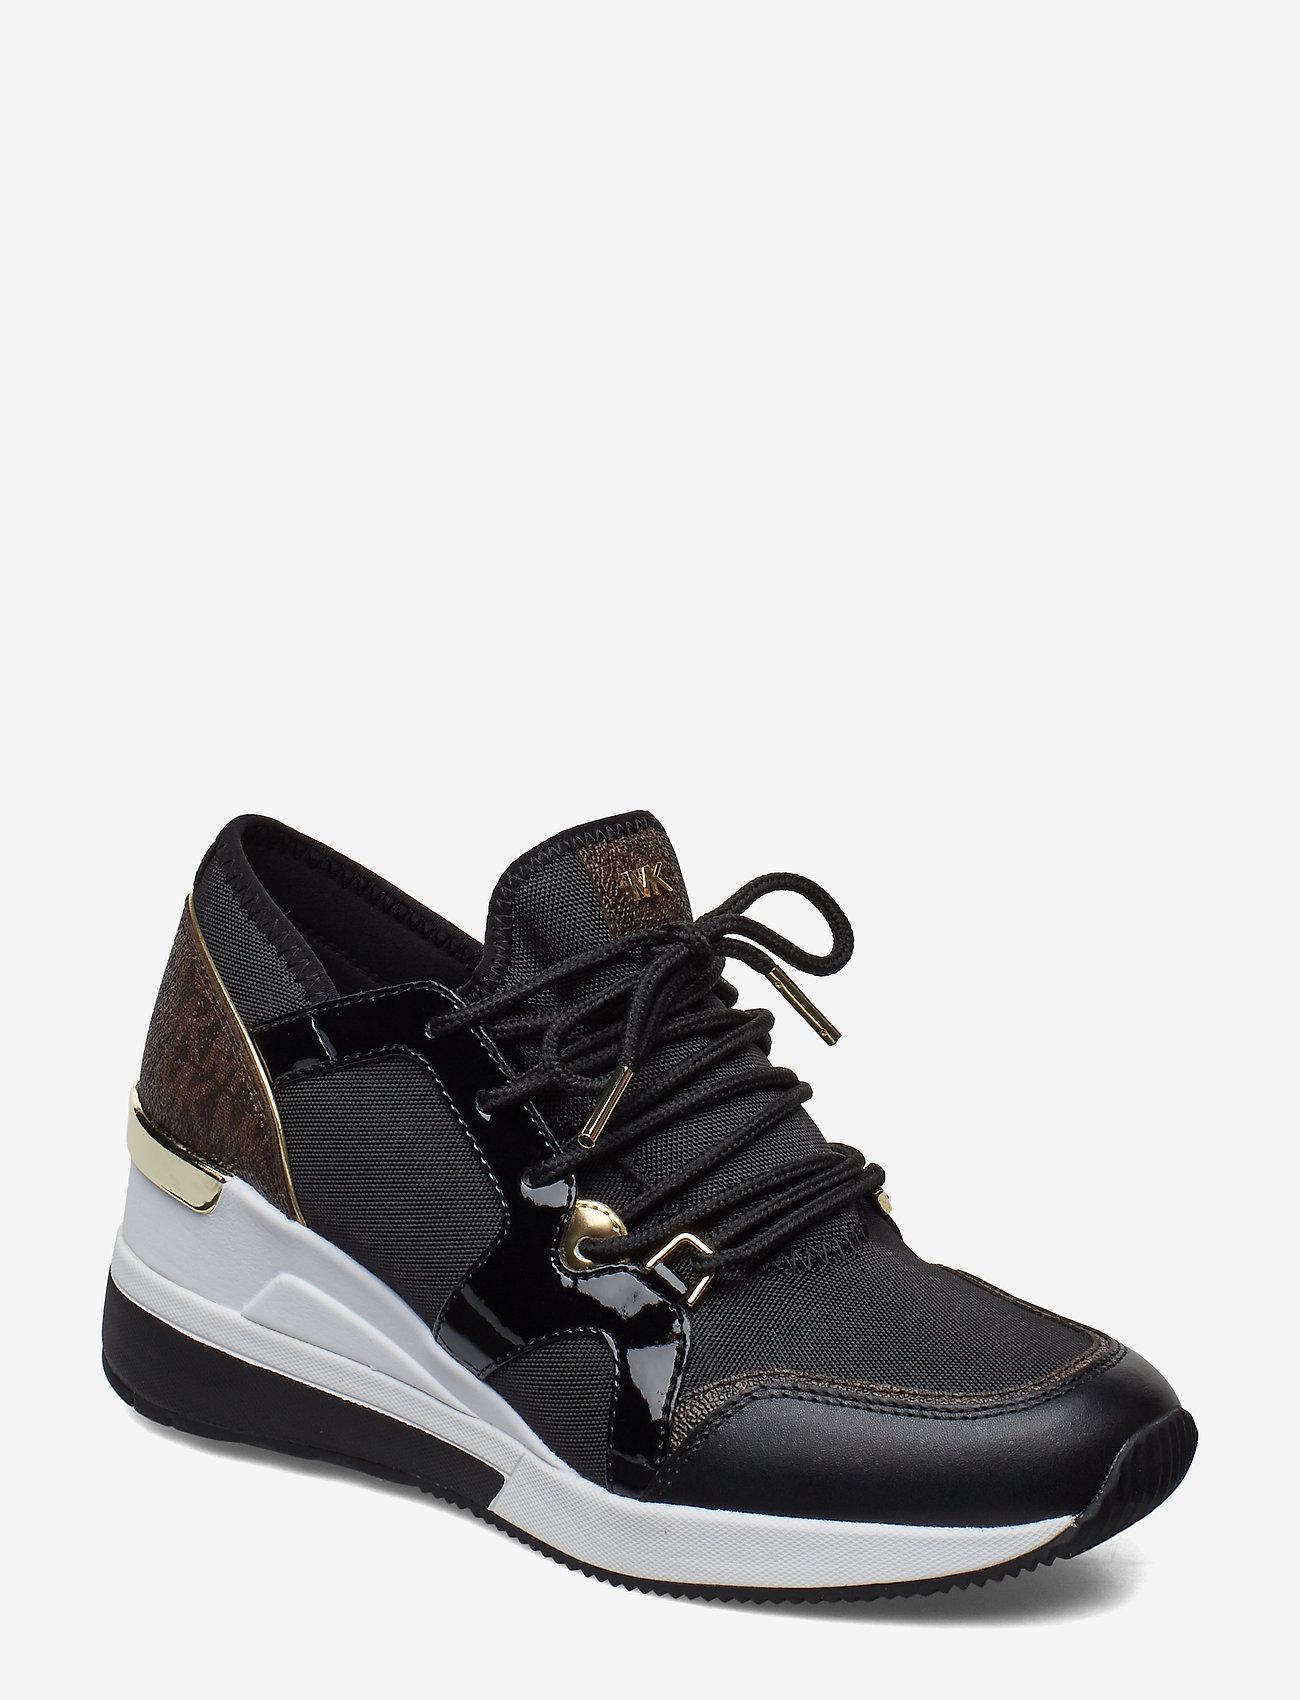 Michael Kors - LIV TRAINER - lage sneakers - black - 0